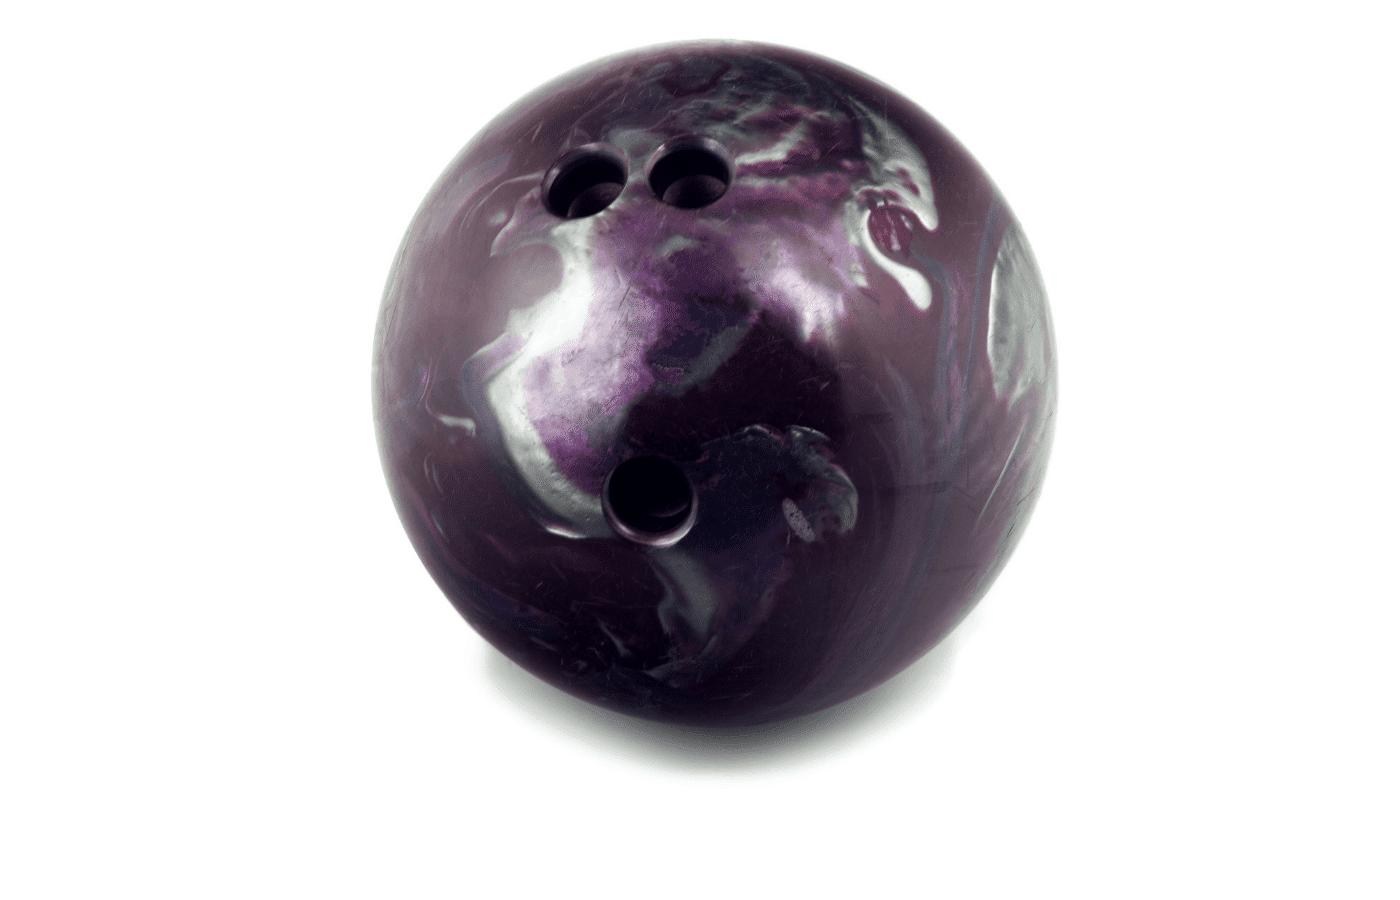 should urethane bowling balls be banned